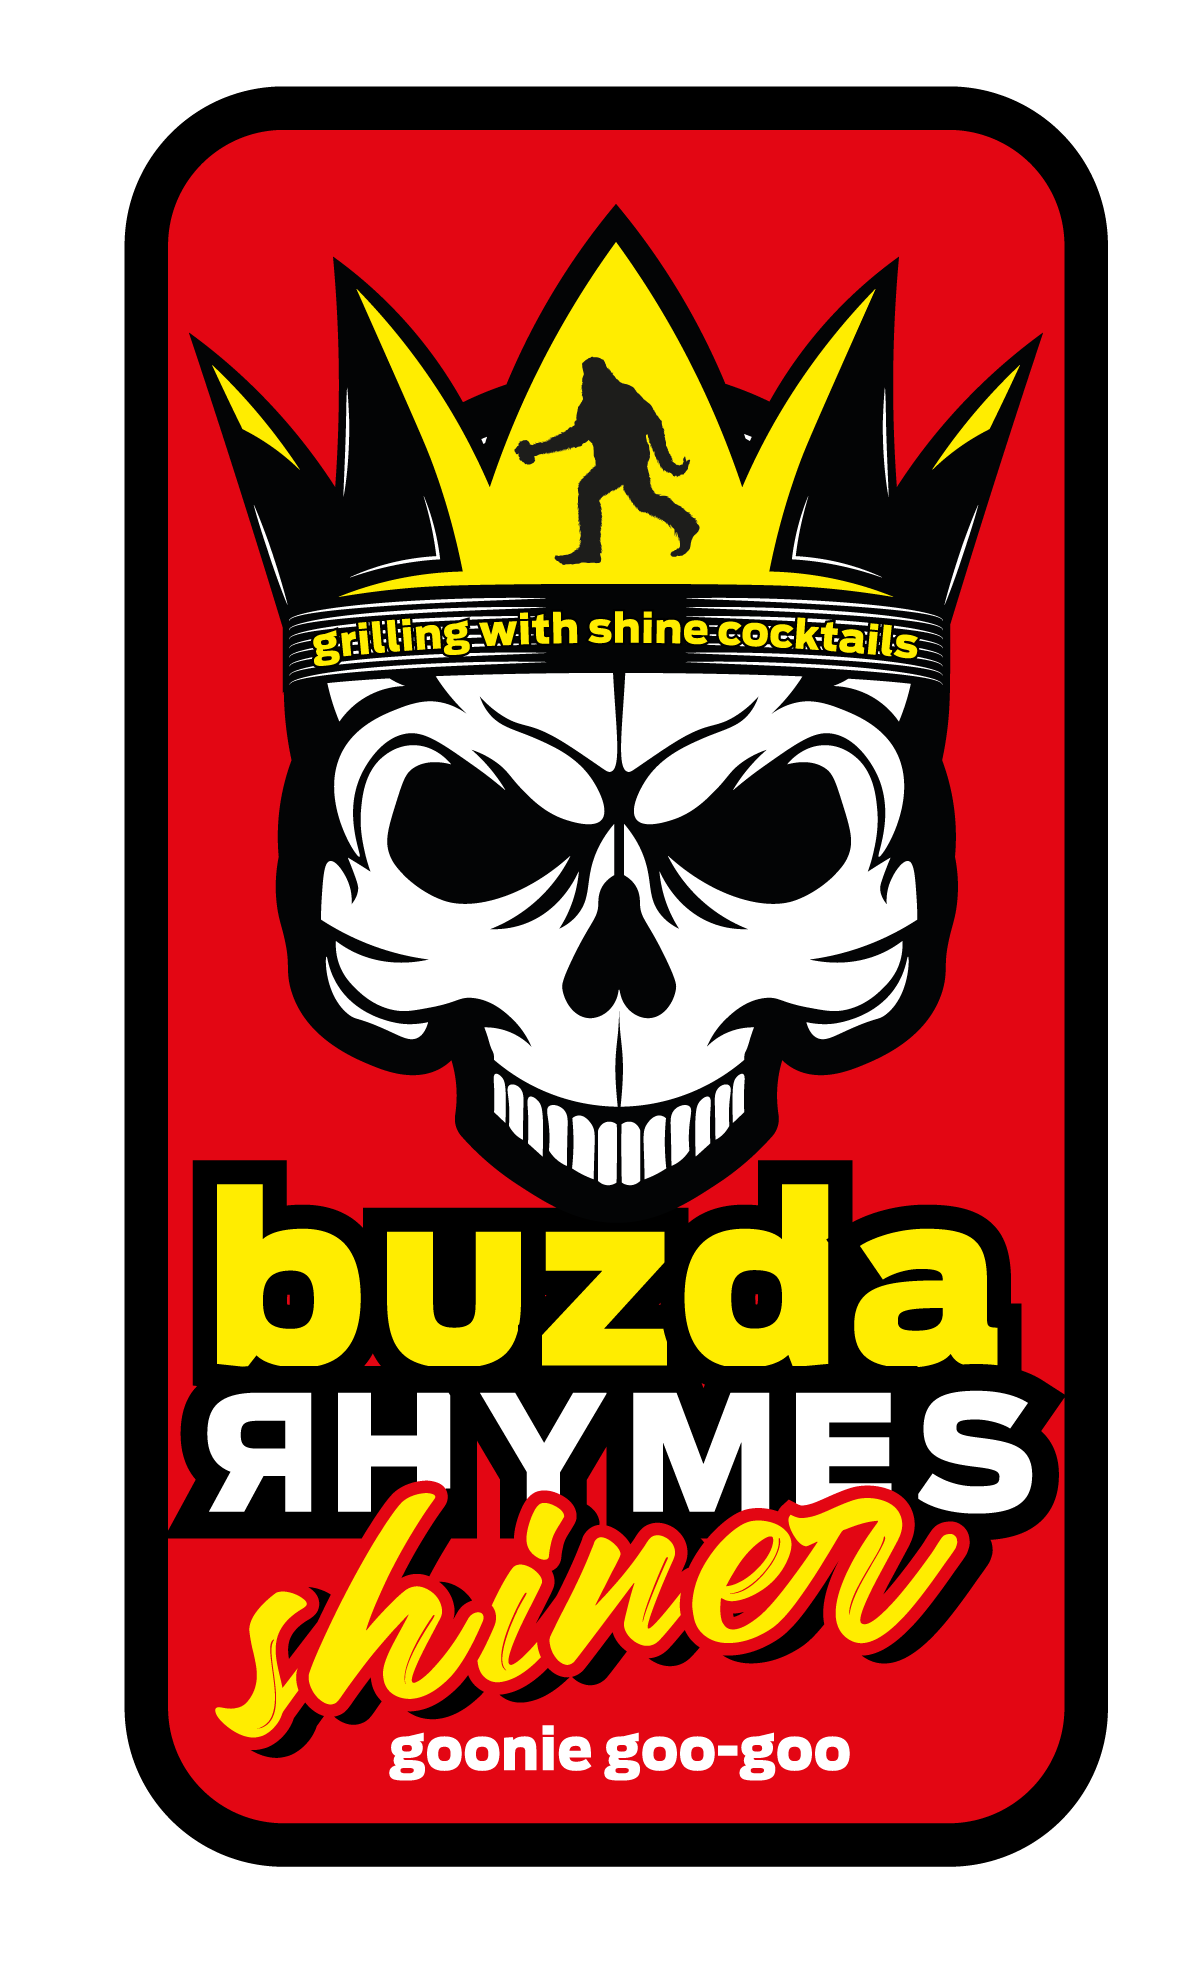 buzda rhymes shiner logo